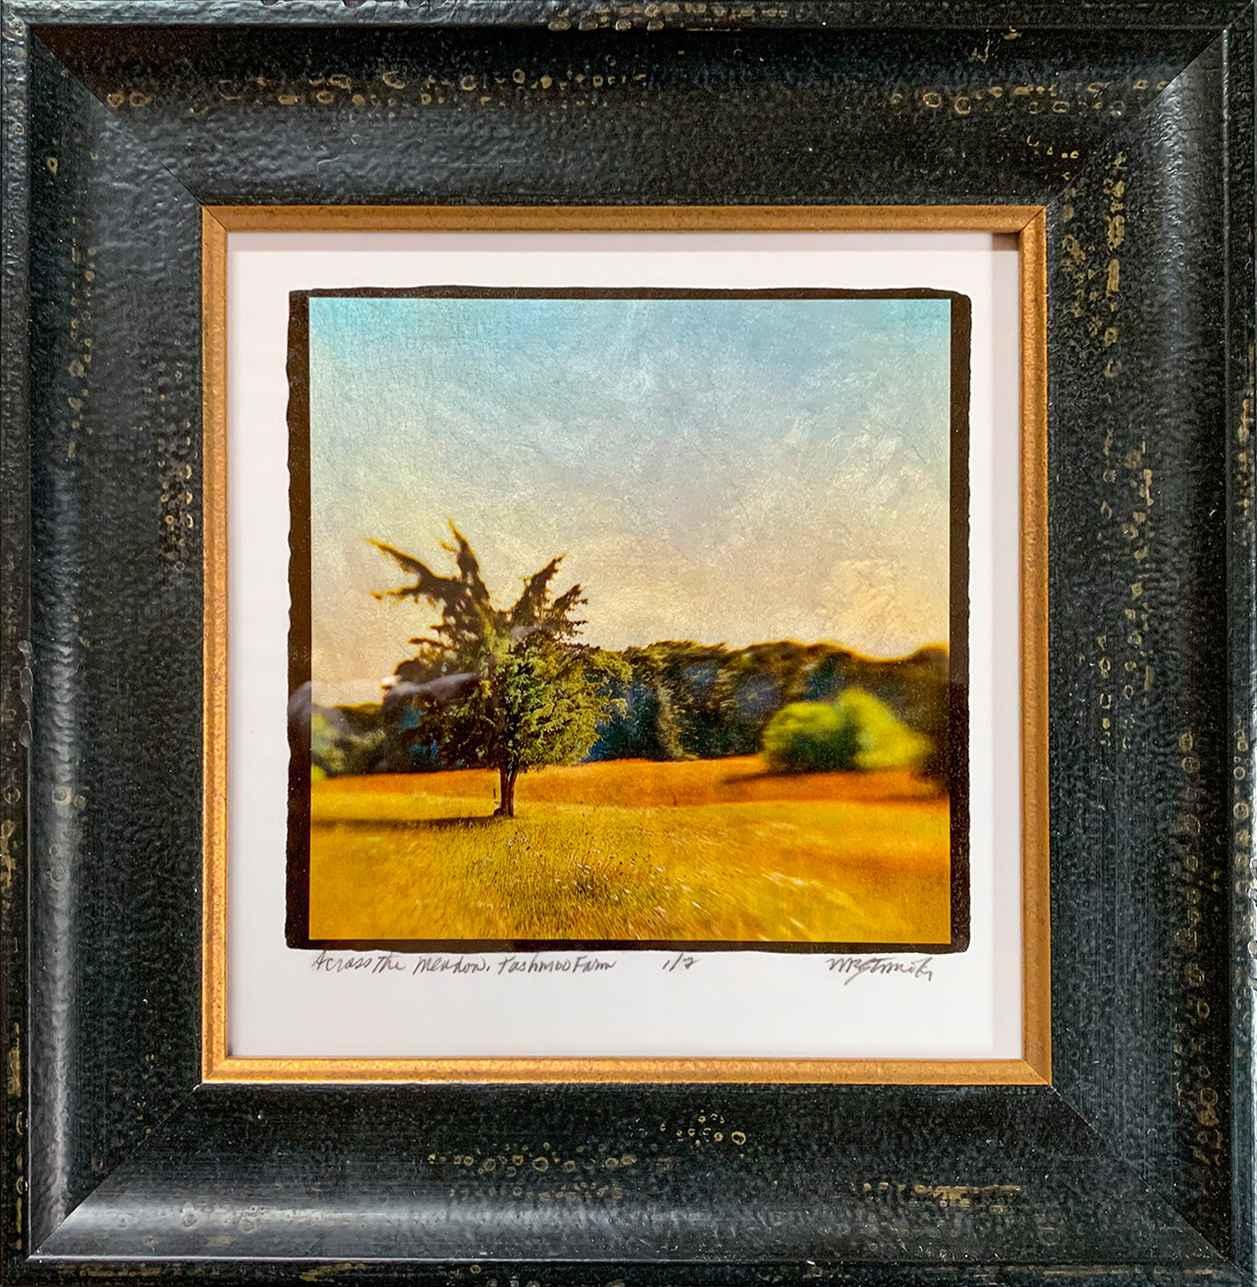 Across the Meadow, Ta... by  Michael Stimola - Masterpiece Online